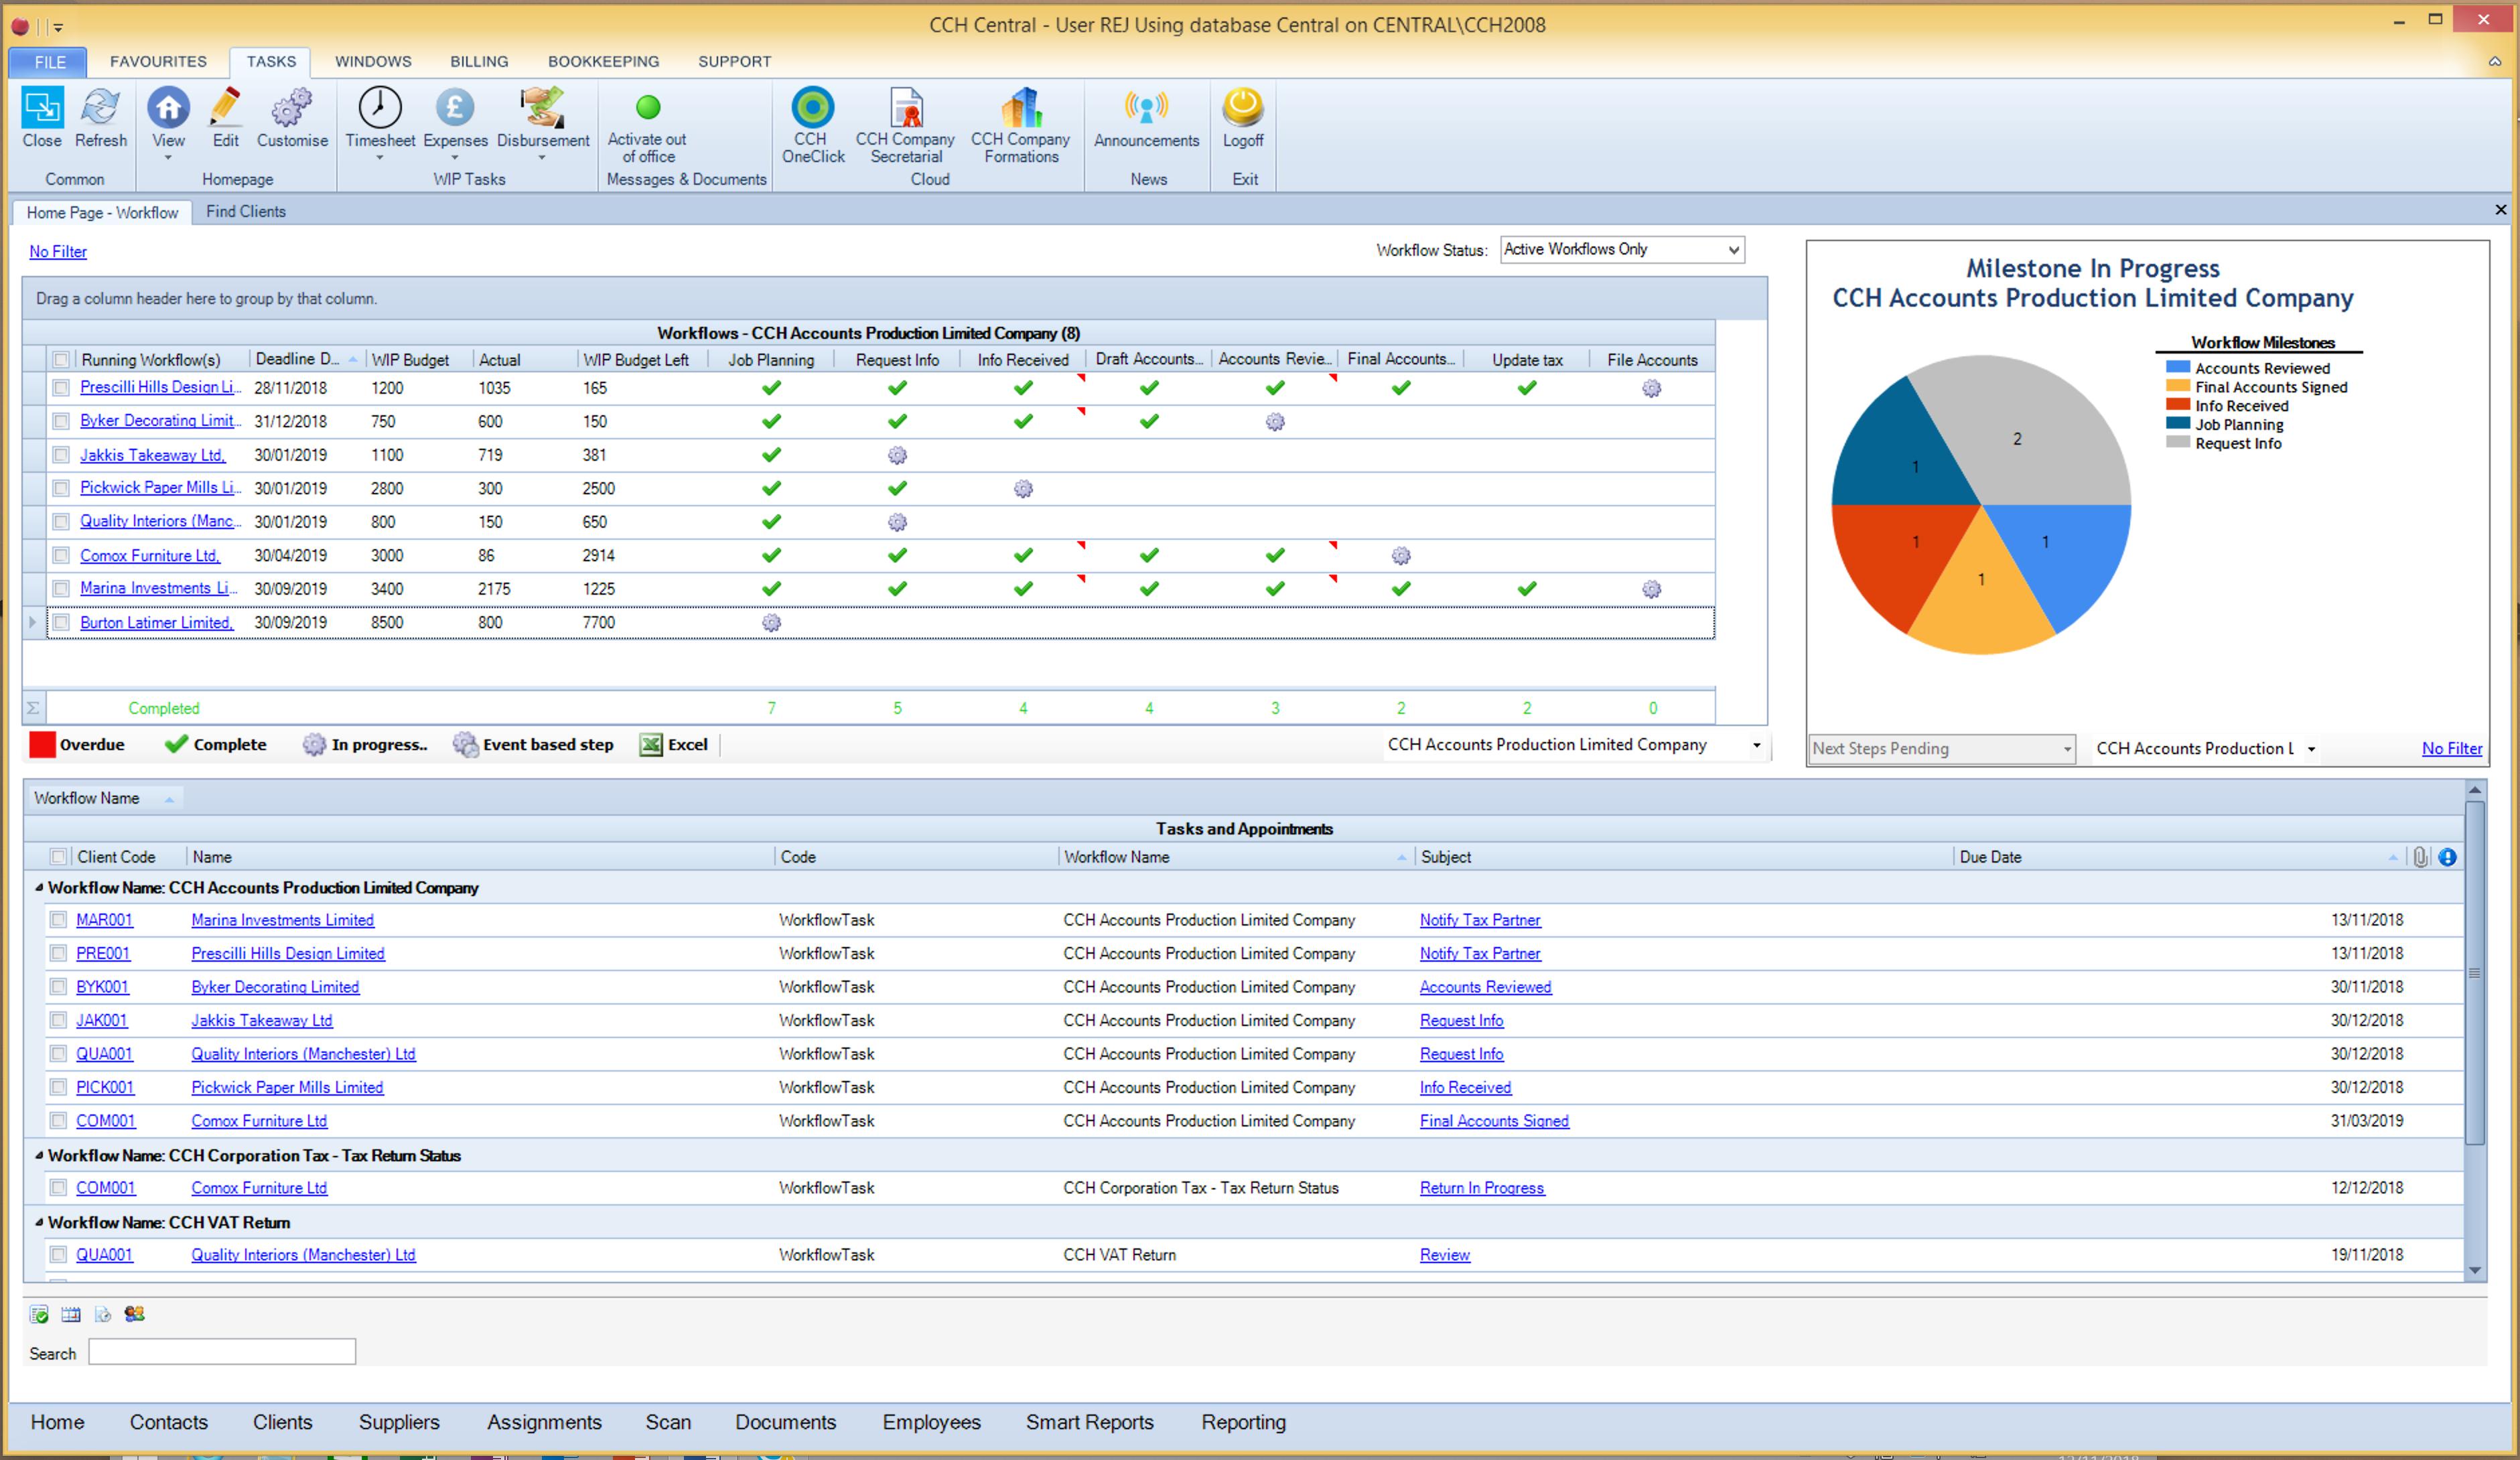 Automate routine processes through workflows